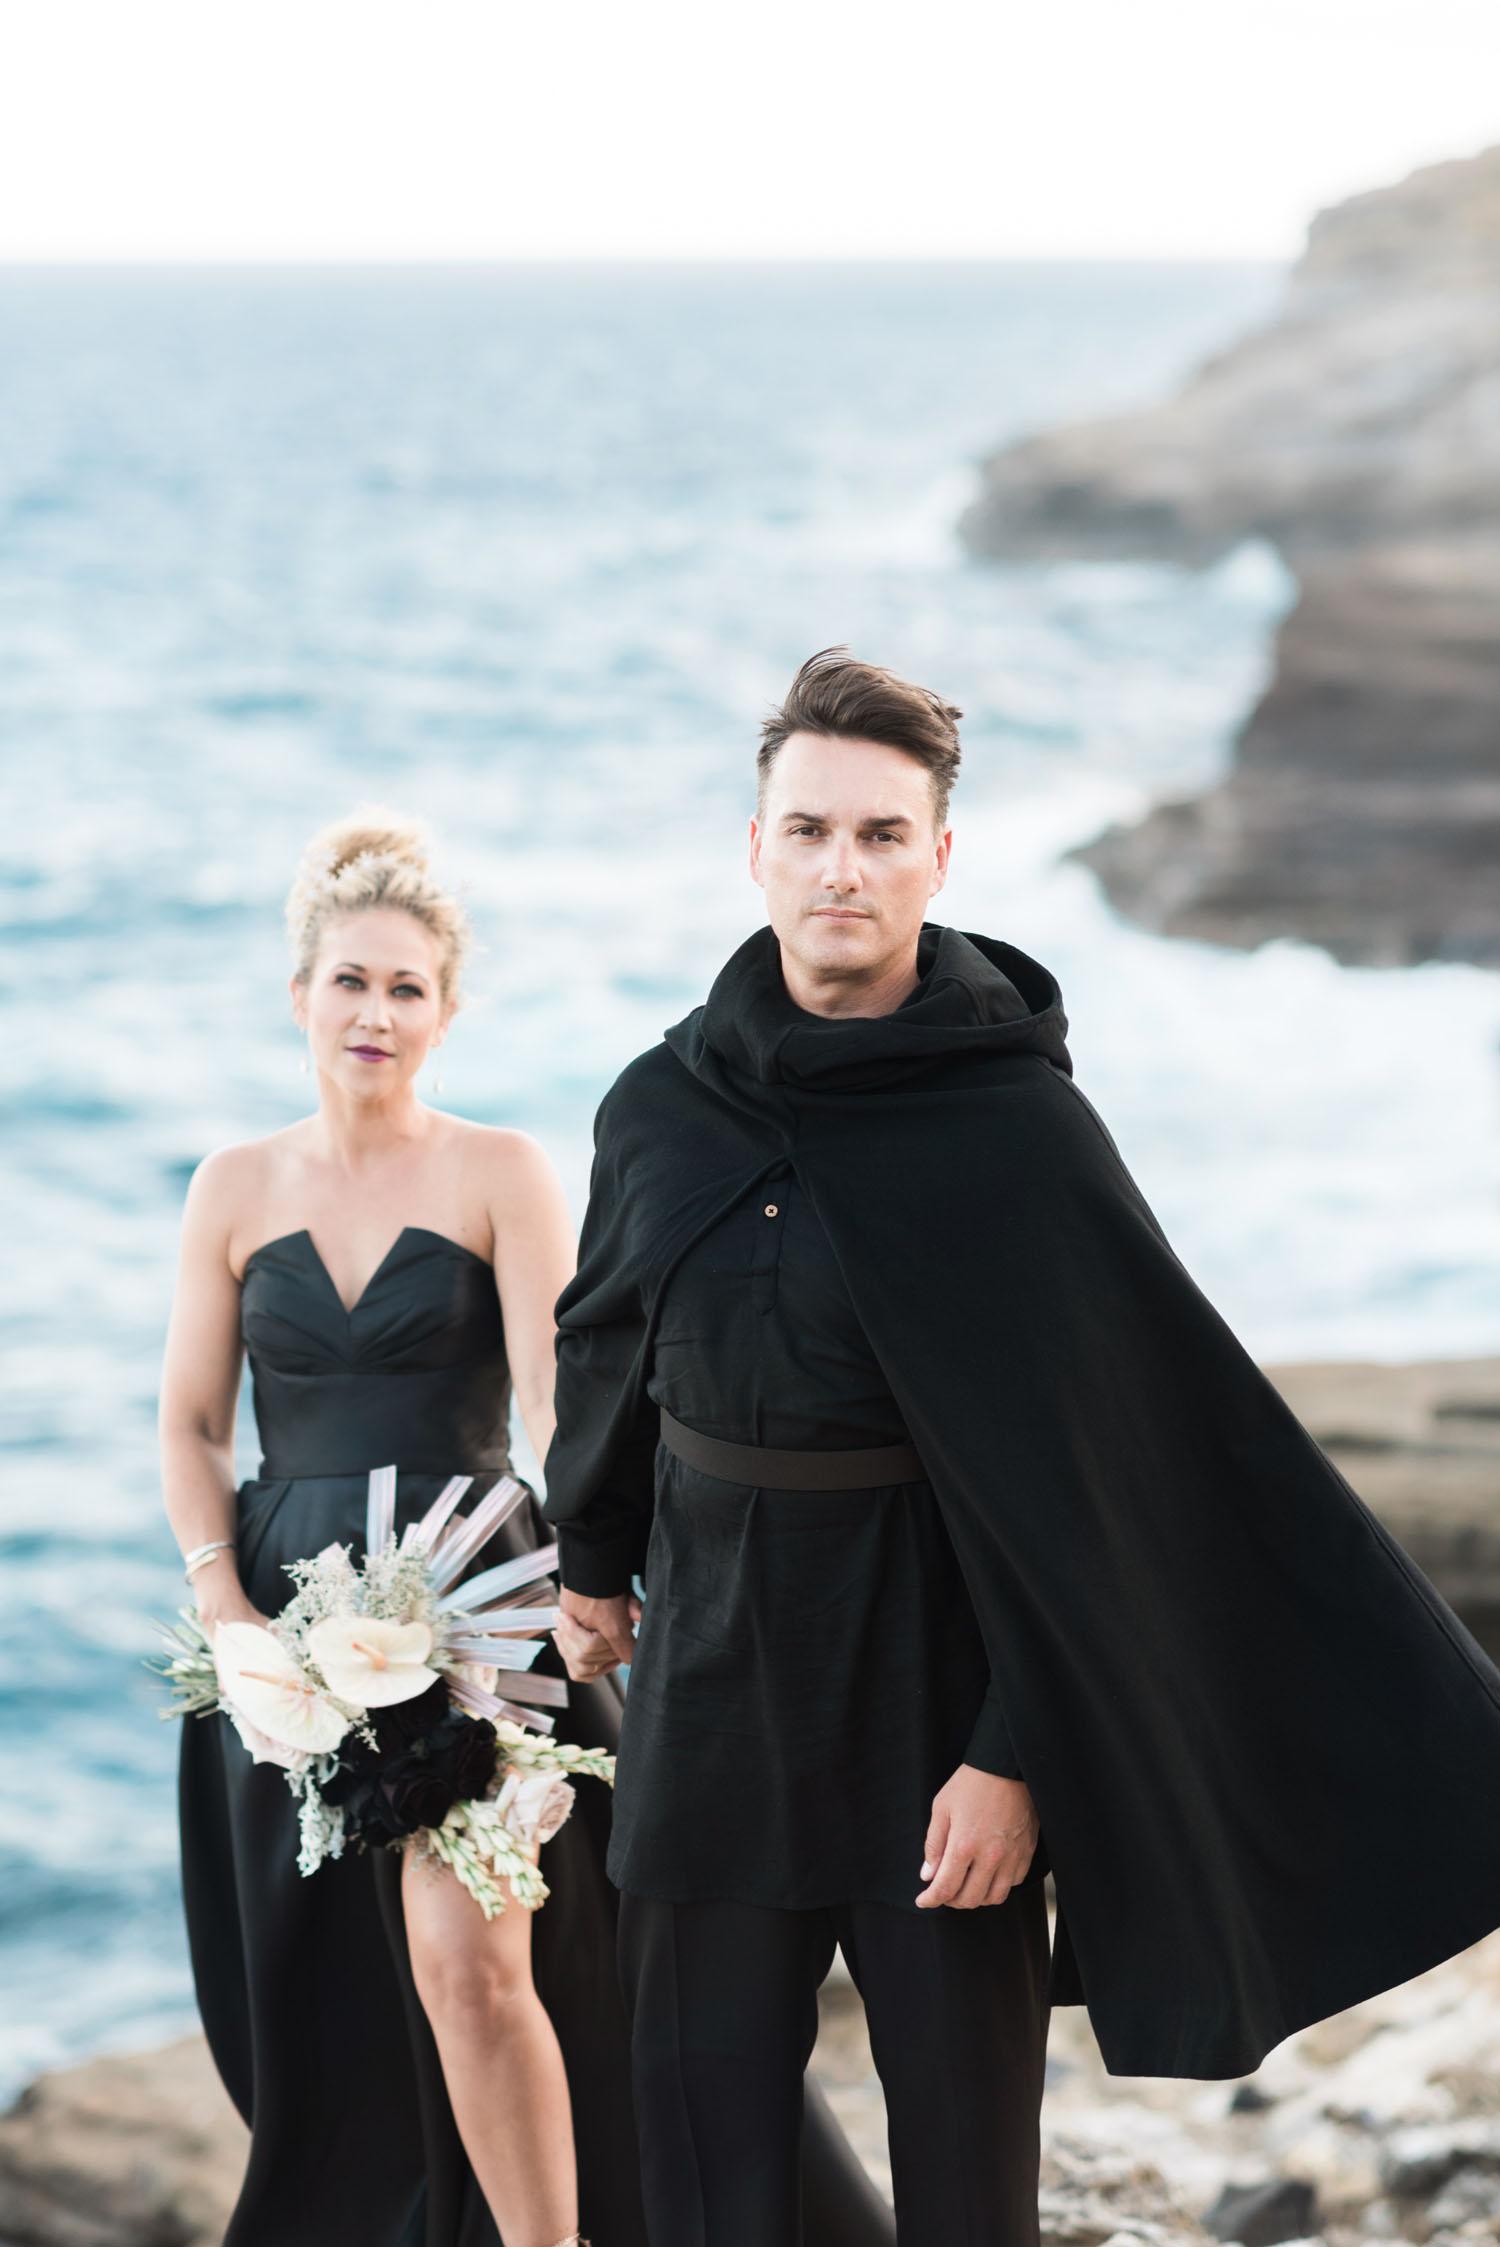 Rey and Kylo Wedding Inspiration